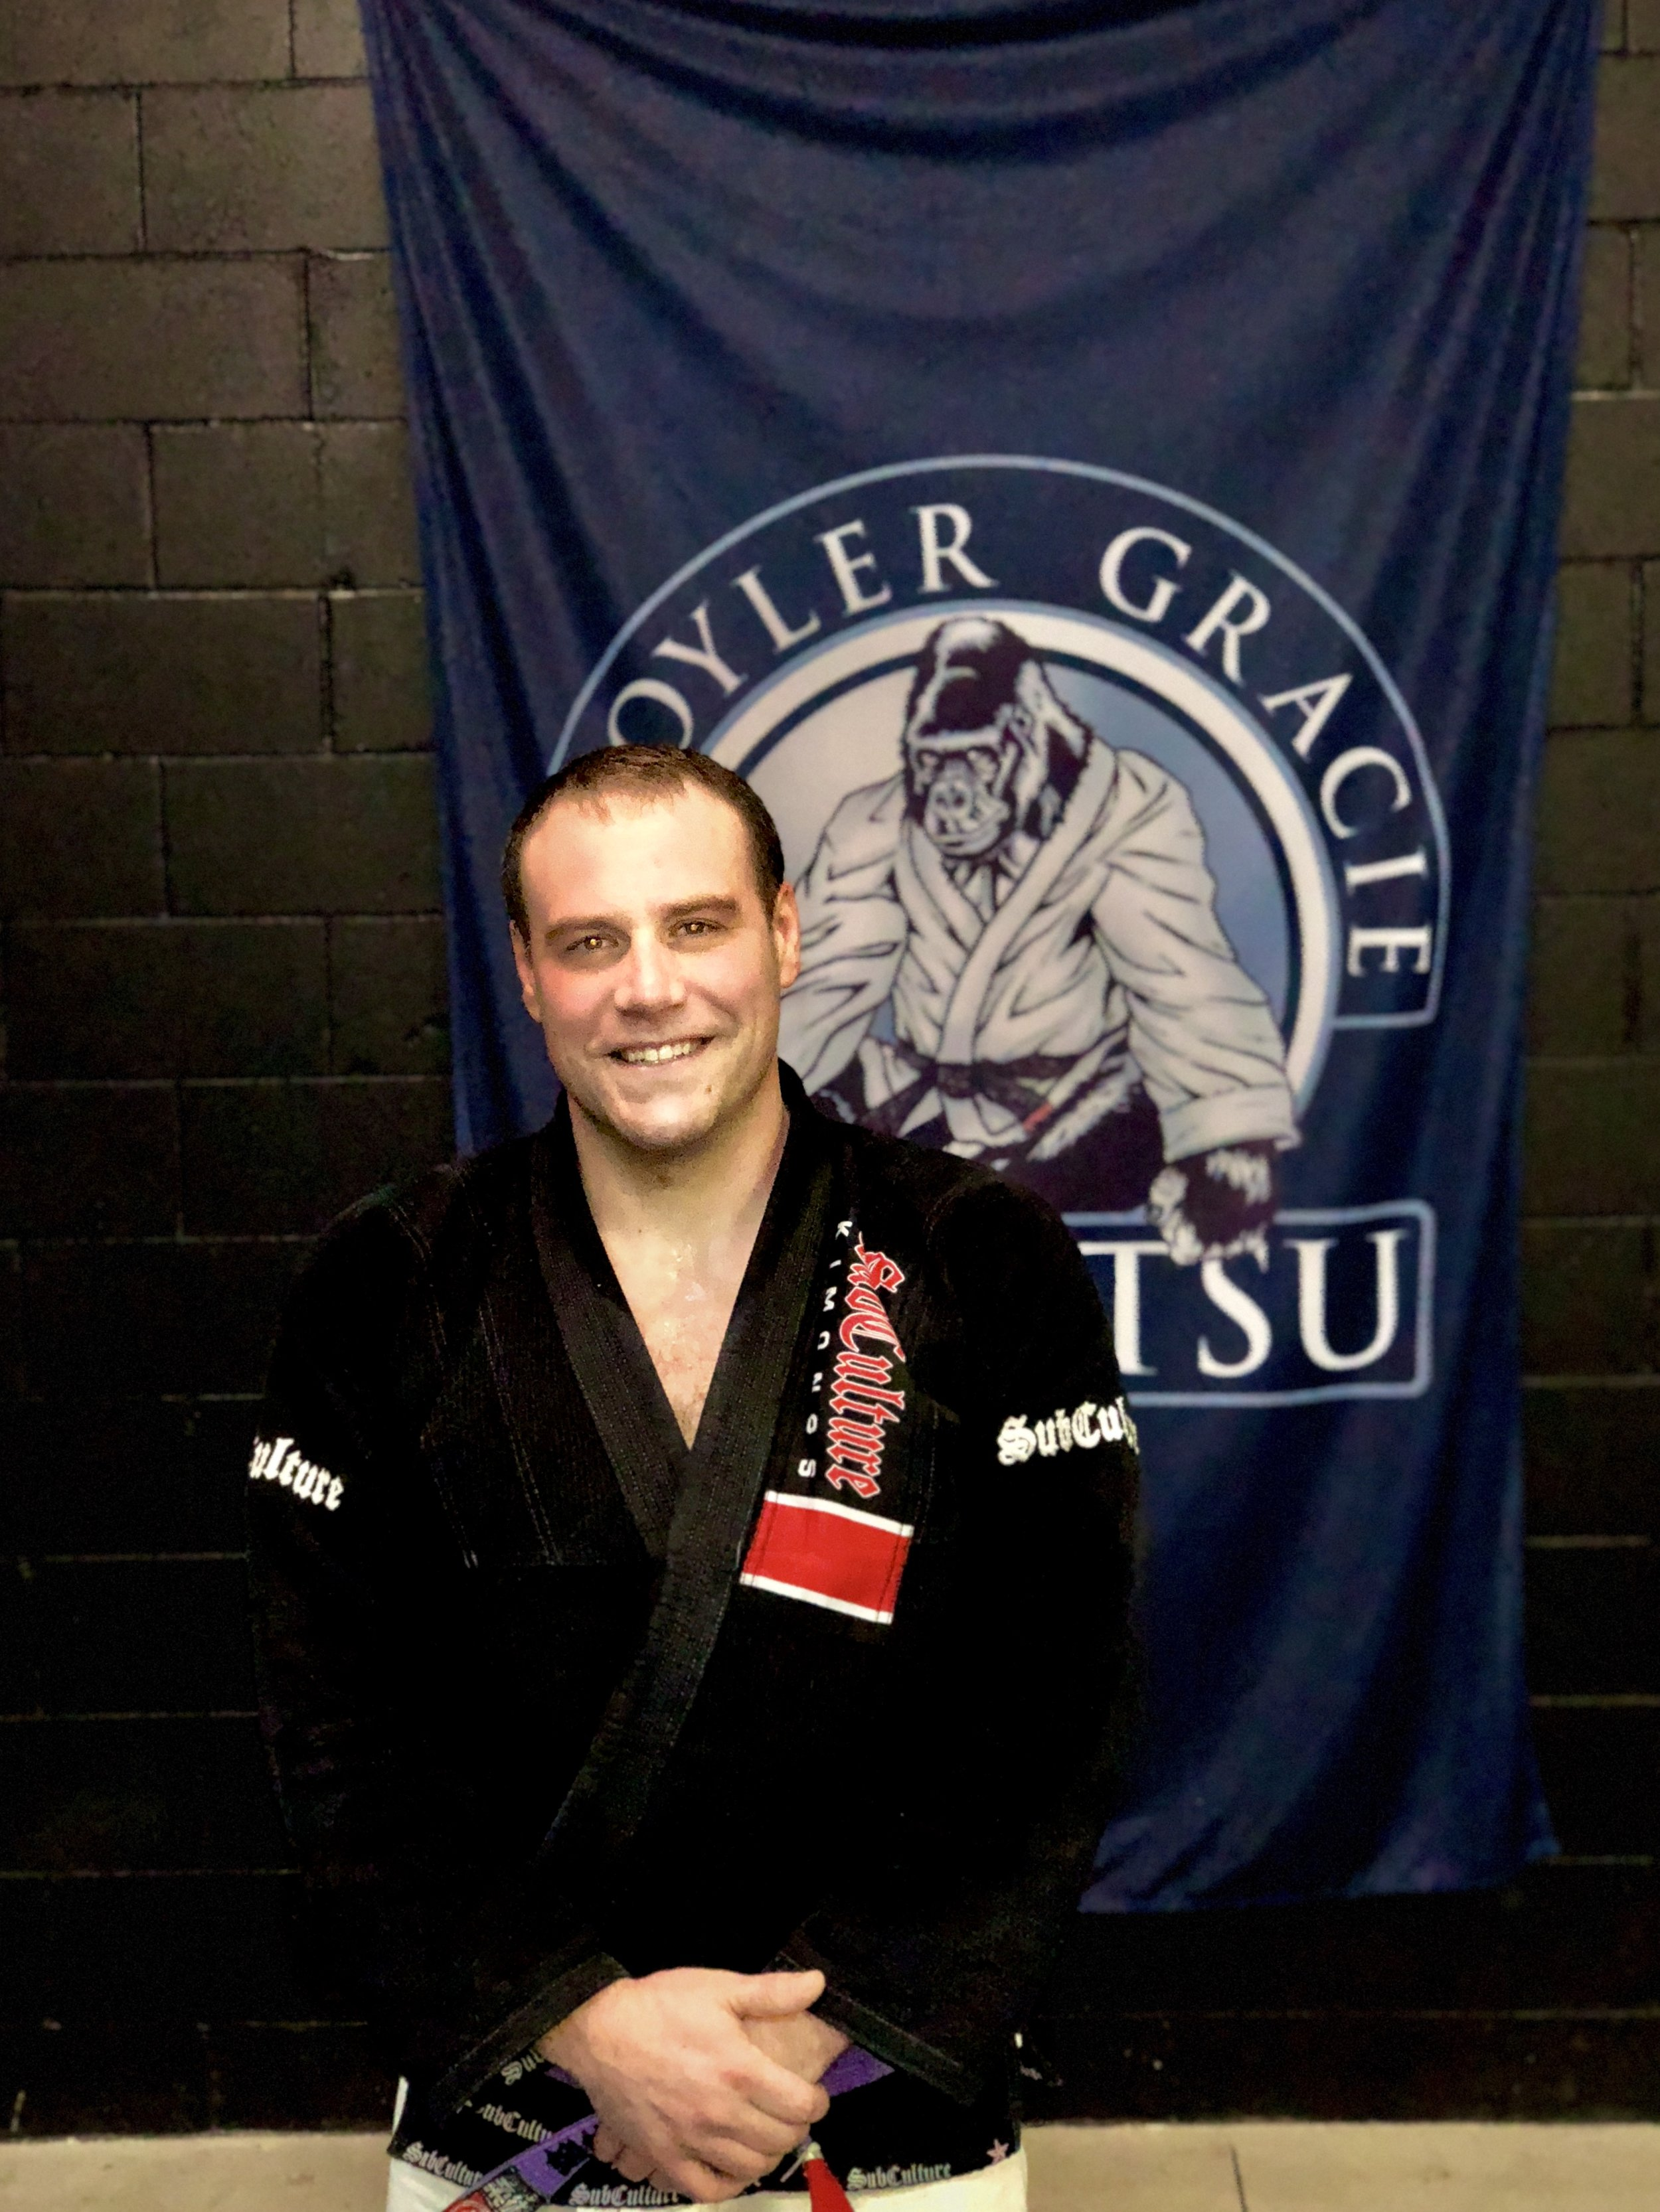 Nathan DeCamp - Brazilian Jiu-Jitsu's Program Head Instructor at Snyder's Dojo, a Kroyler Gracie Jiu-Jitsu Affiliate